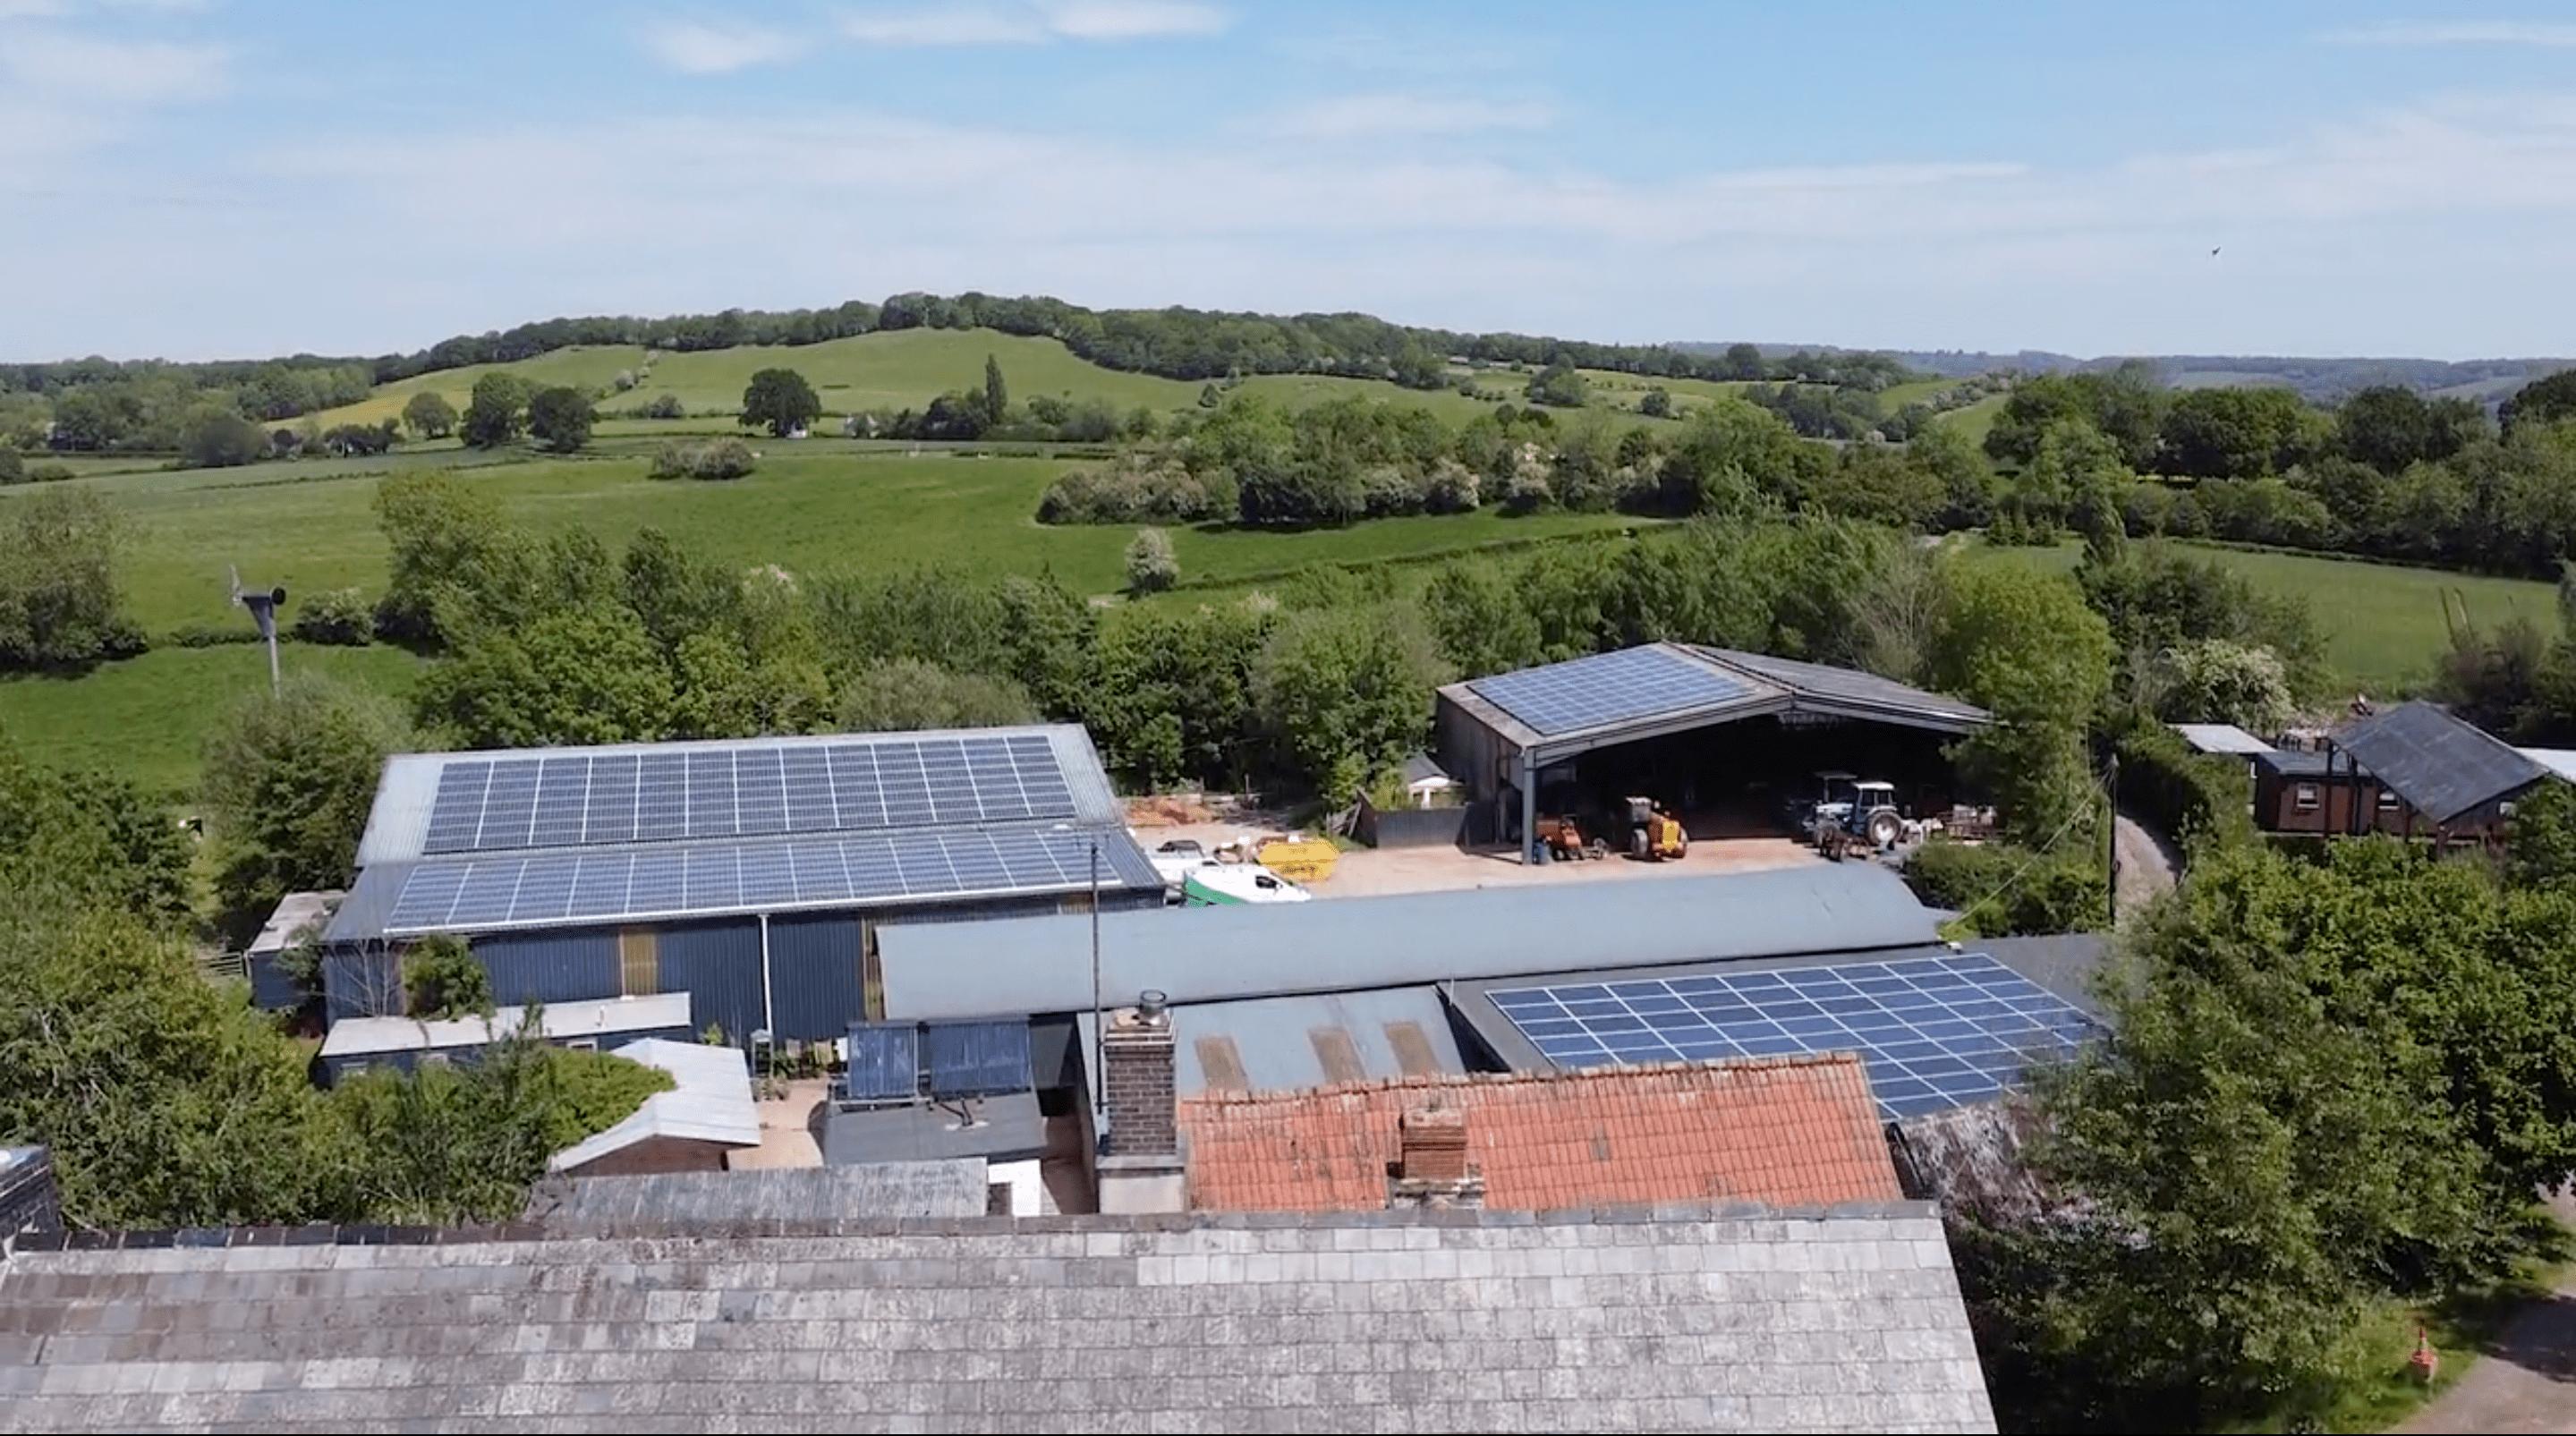 Caplor farm eith some of its renewable energy technologies on show